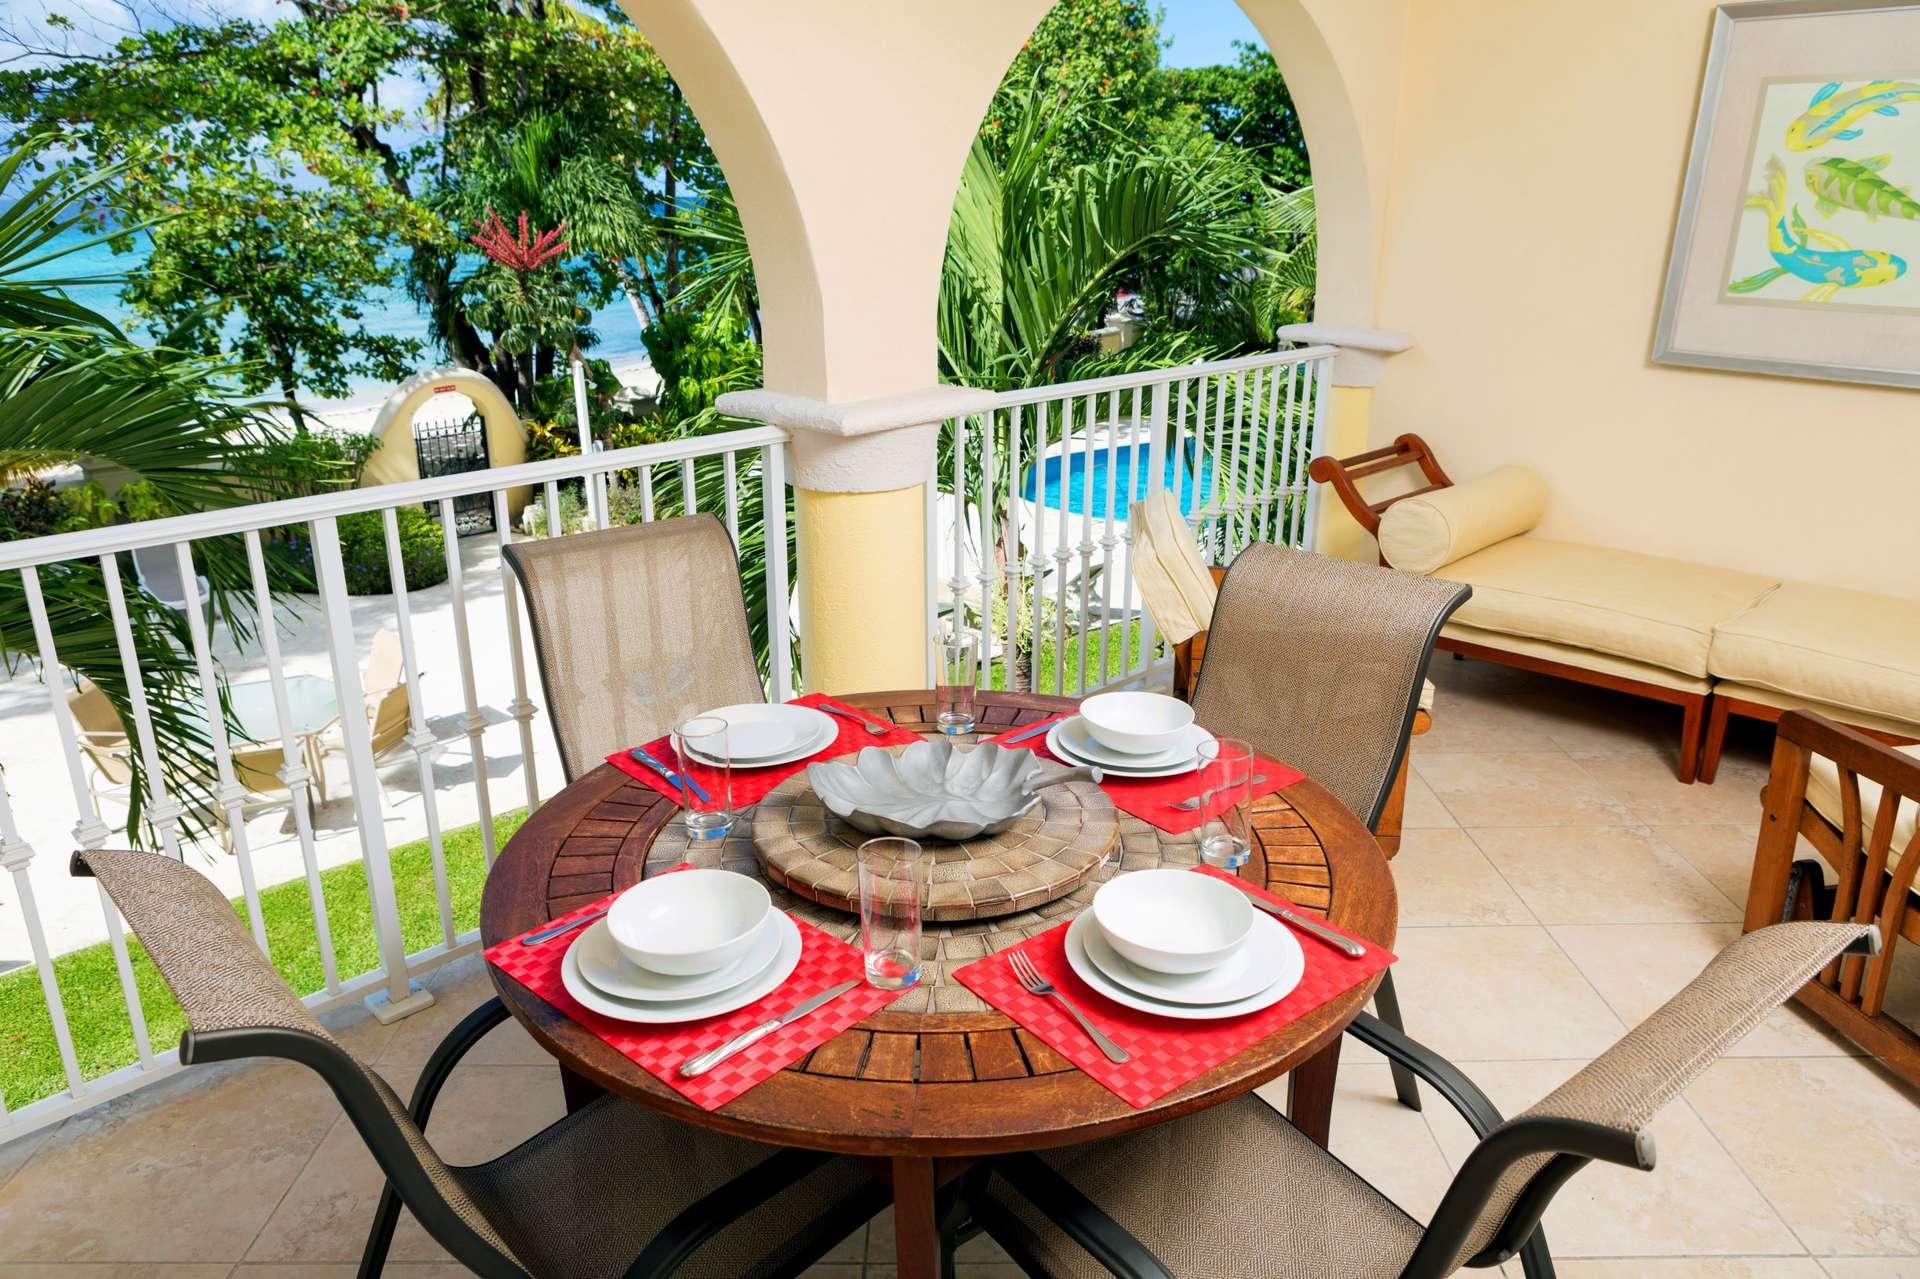 Luxury villa rentals caribbean - Barbados - Christ church - Oistins  - Sapphire Beach 109 - Image 1/8